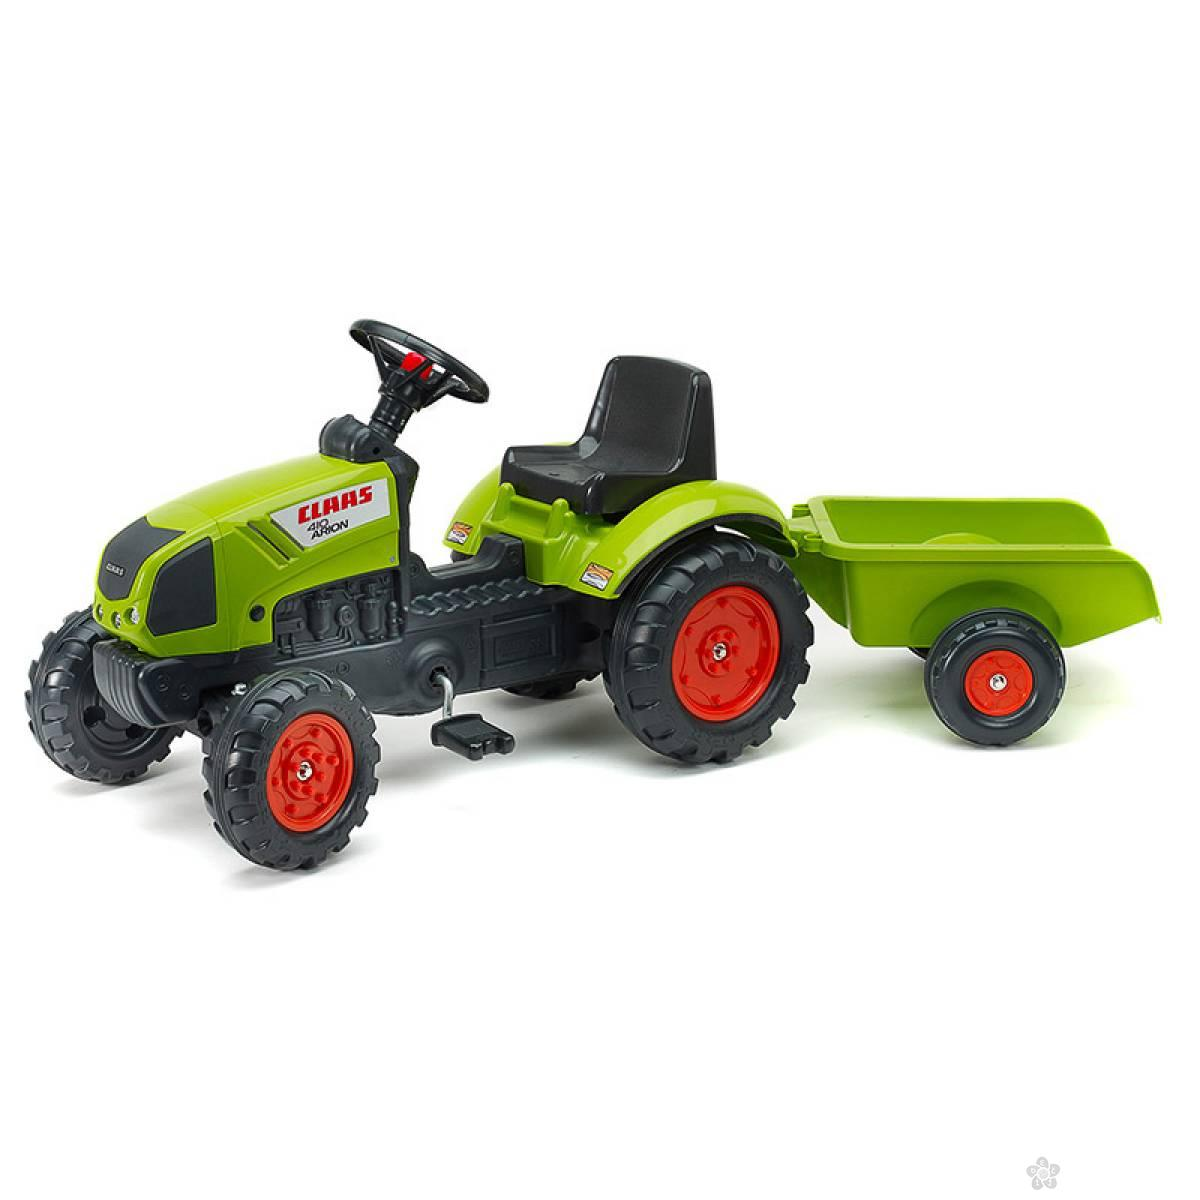 Traktor na pedale Claas 2040a